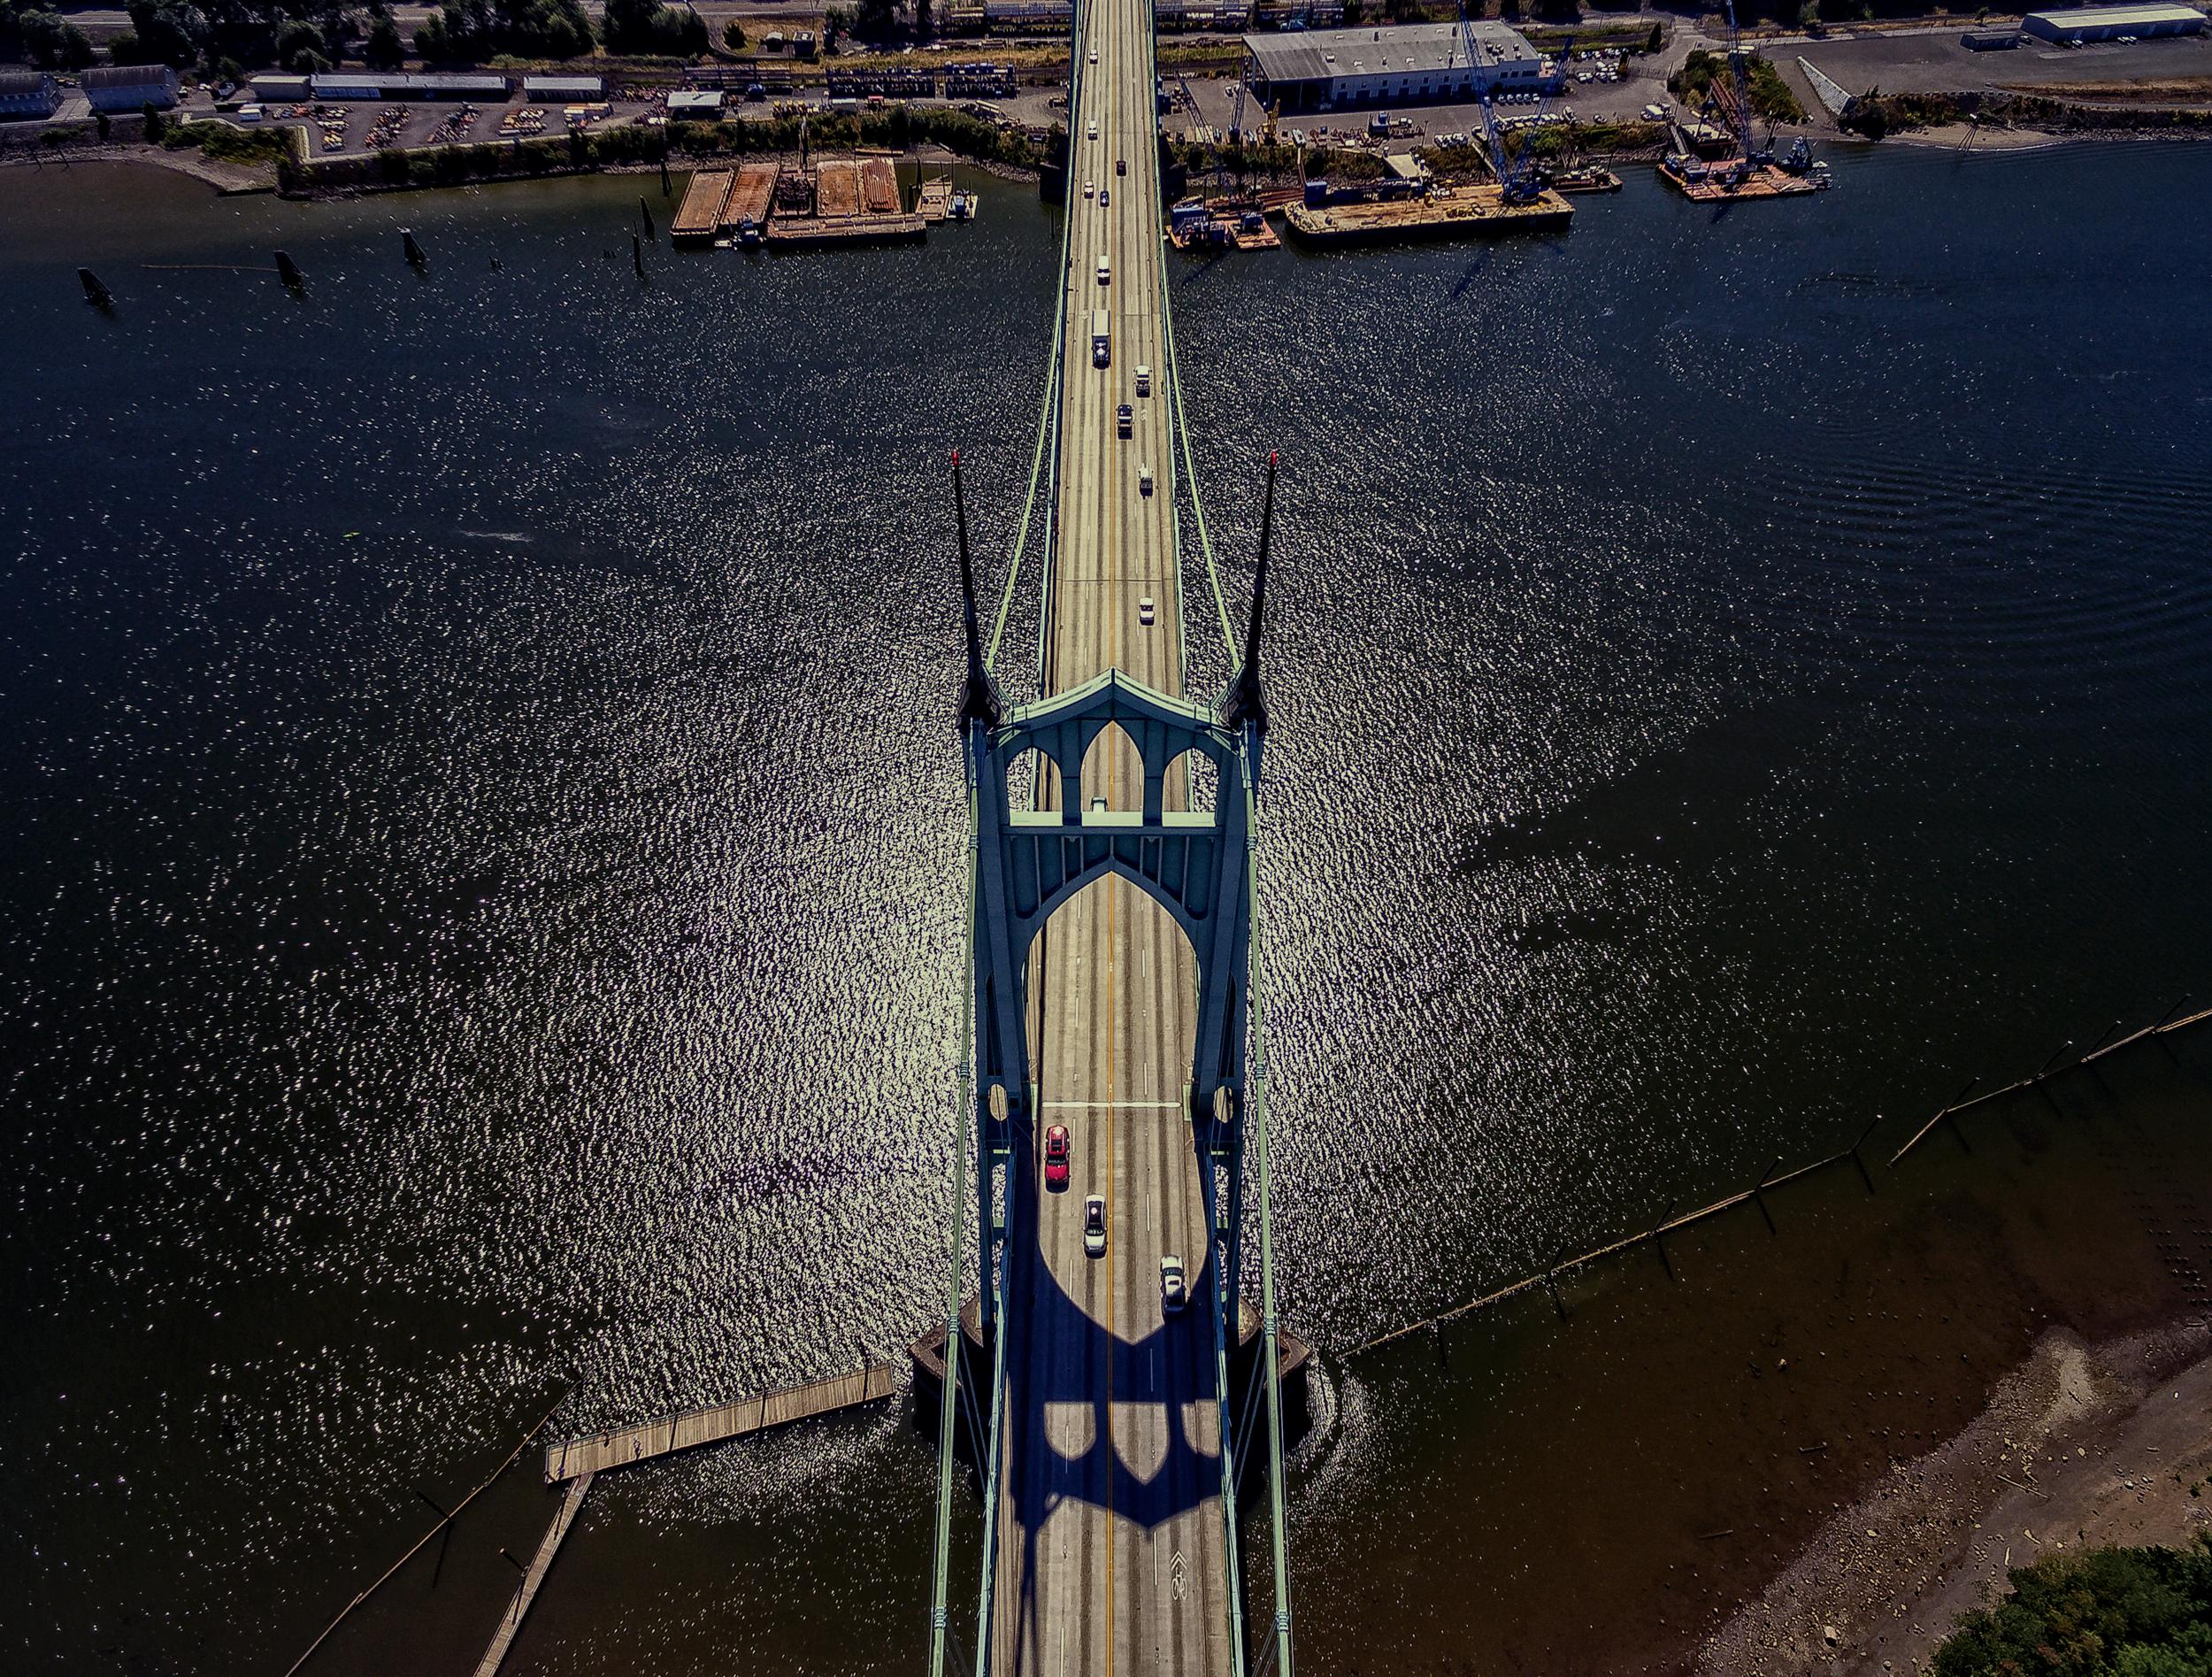 St-johns-bridge-topDJI_0044-1web.png